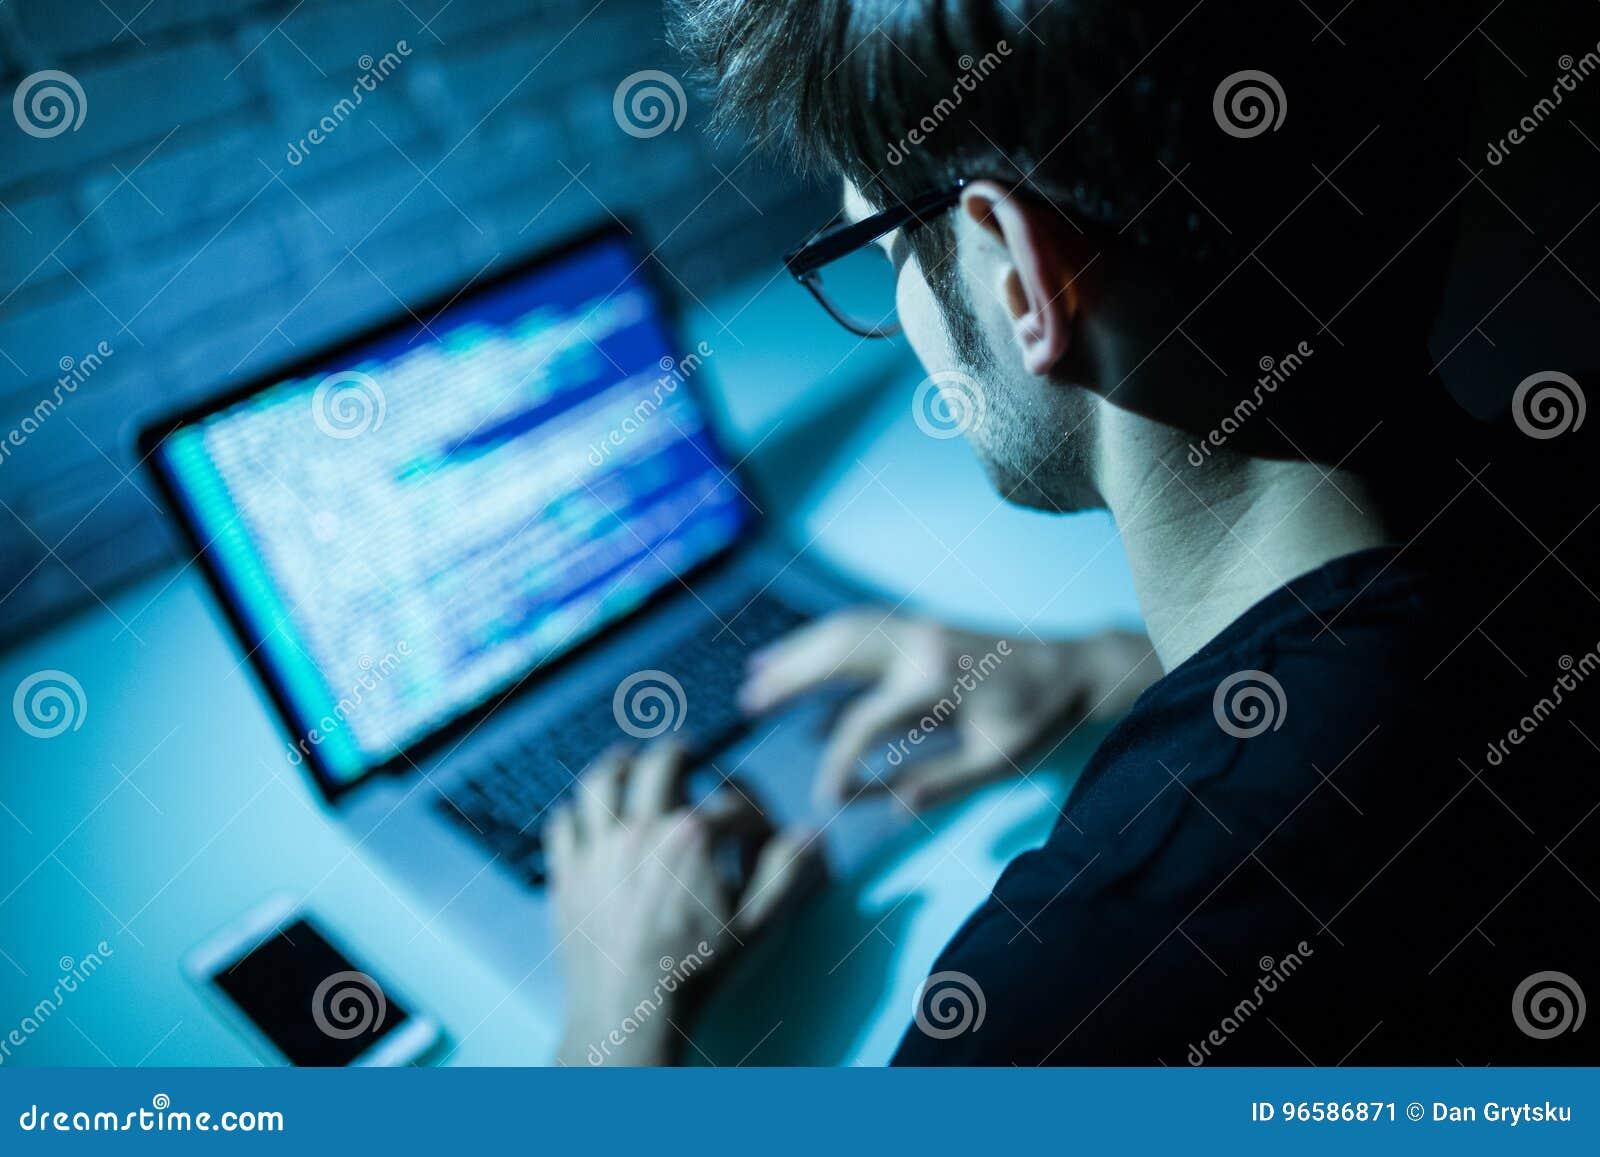 Man using laptop writing programming code on laptop. Young hacker work on laptop in the night